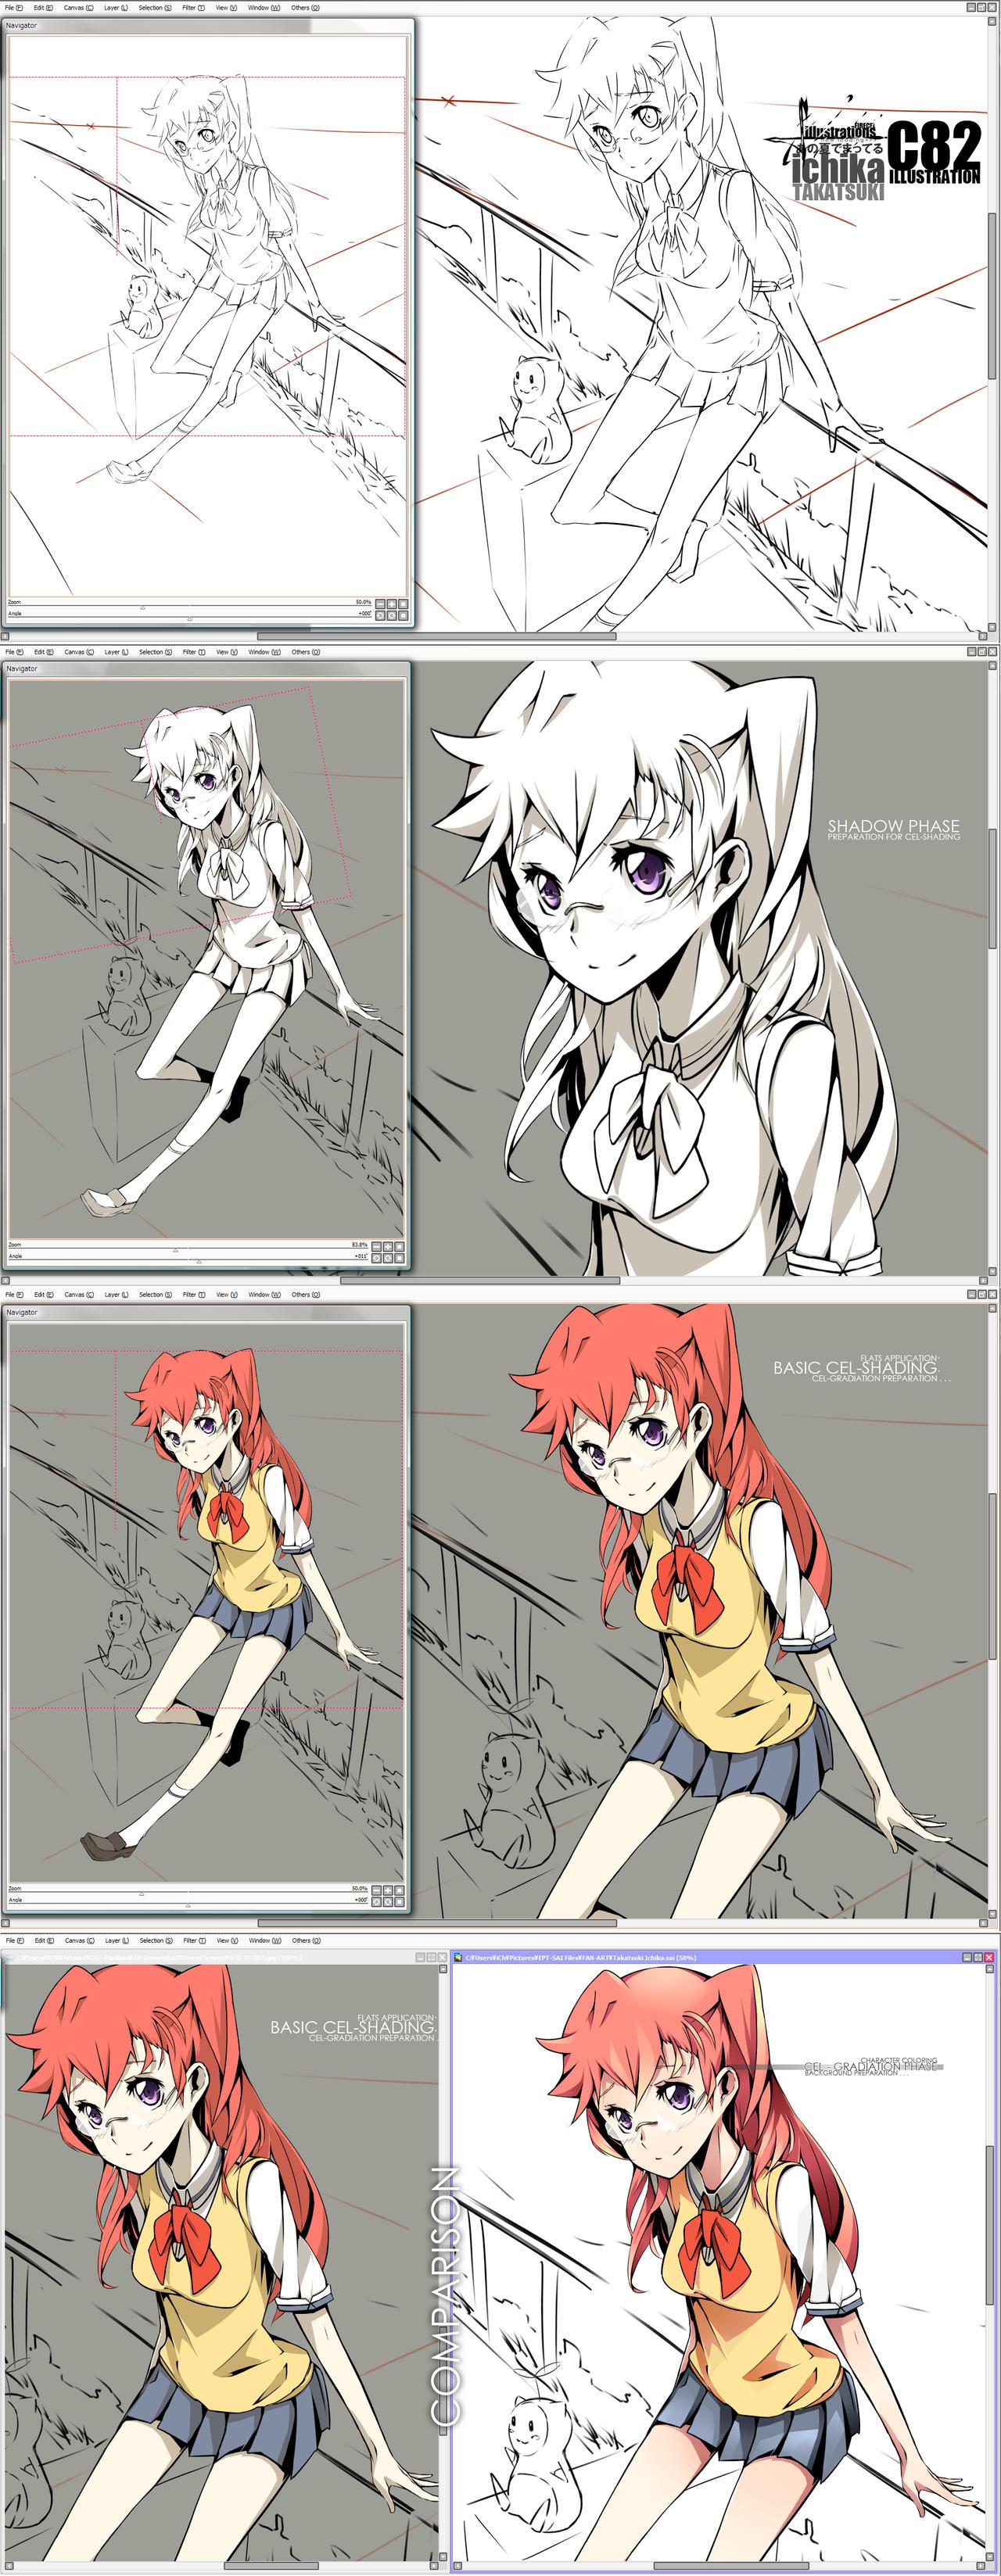 DS - Takatsuki Ichika - C82 Illustration by Firecel